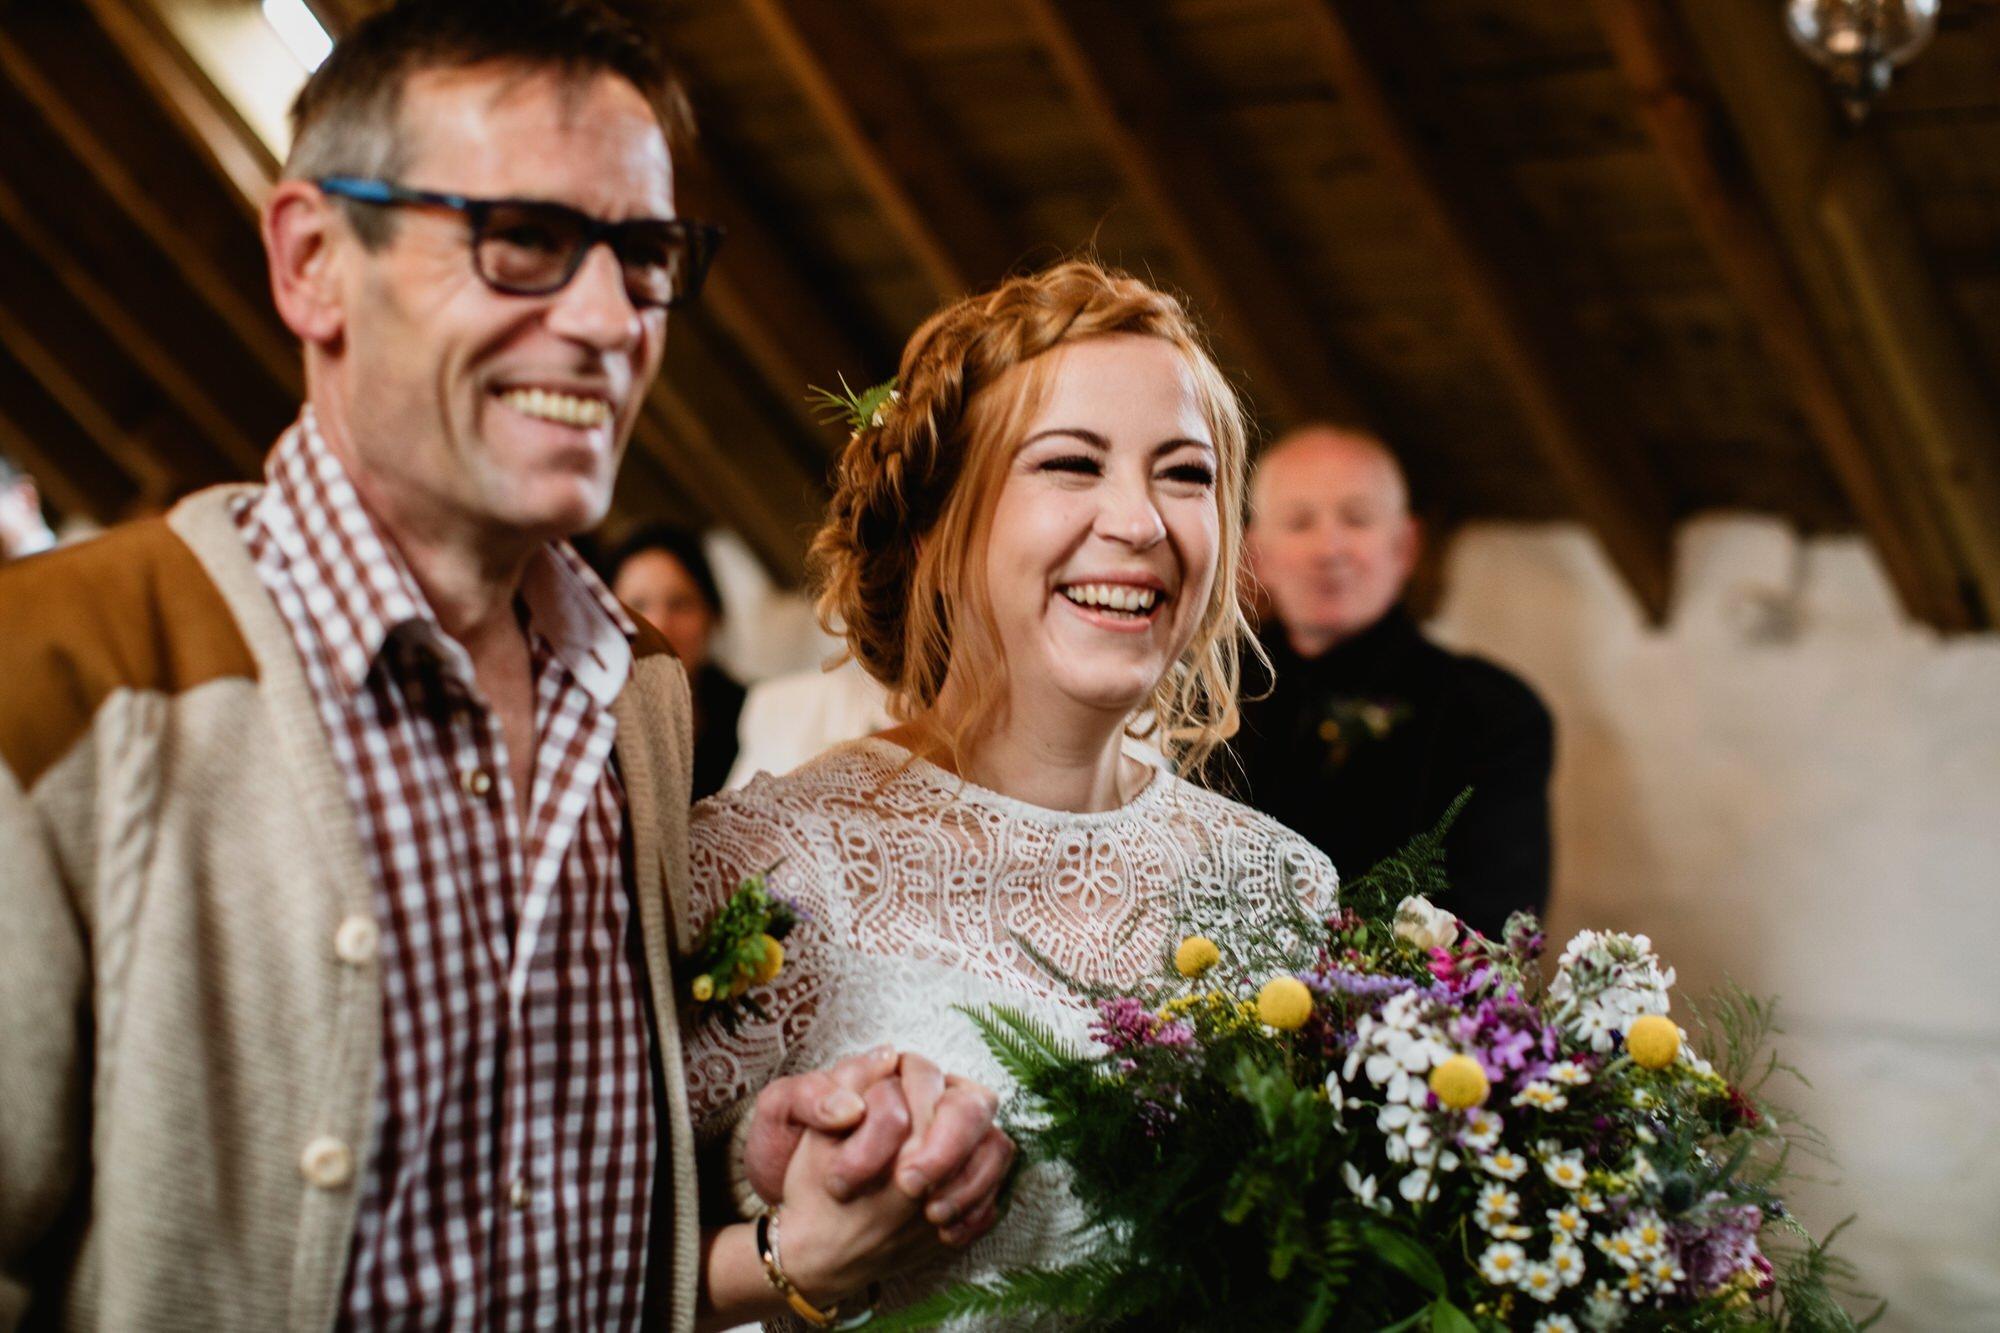 018 TIN SHED KNOCKRAICH WEDDING AUSTRIAN SCOTTISH ZOE ALEXANDRA PHOTOGRAPHY